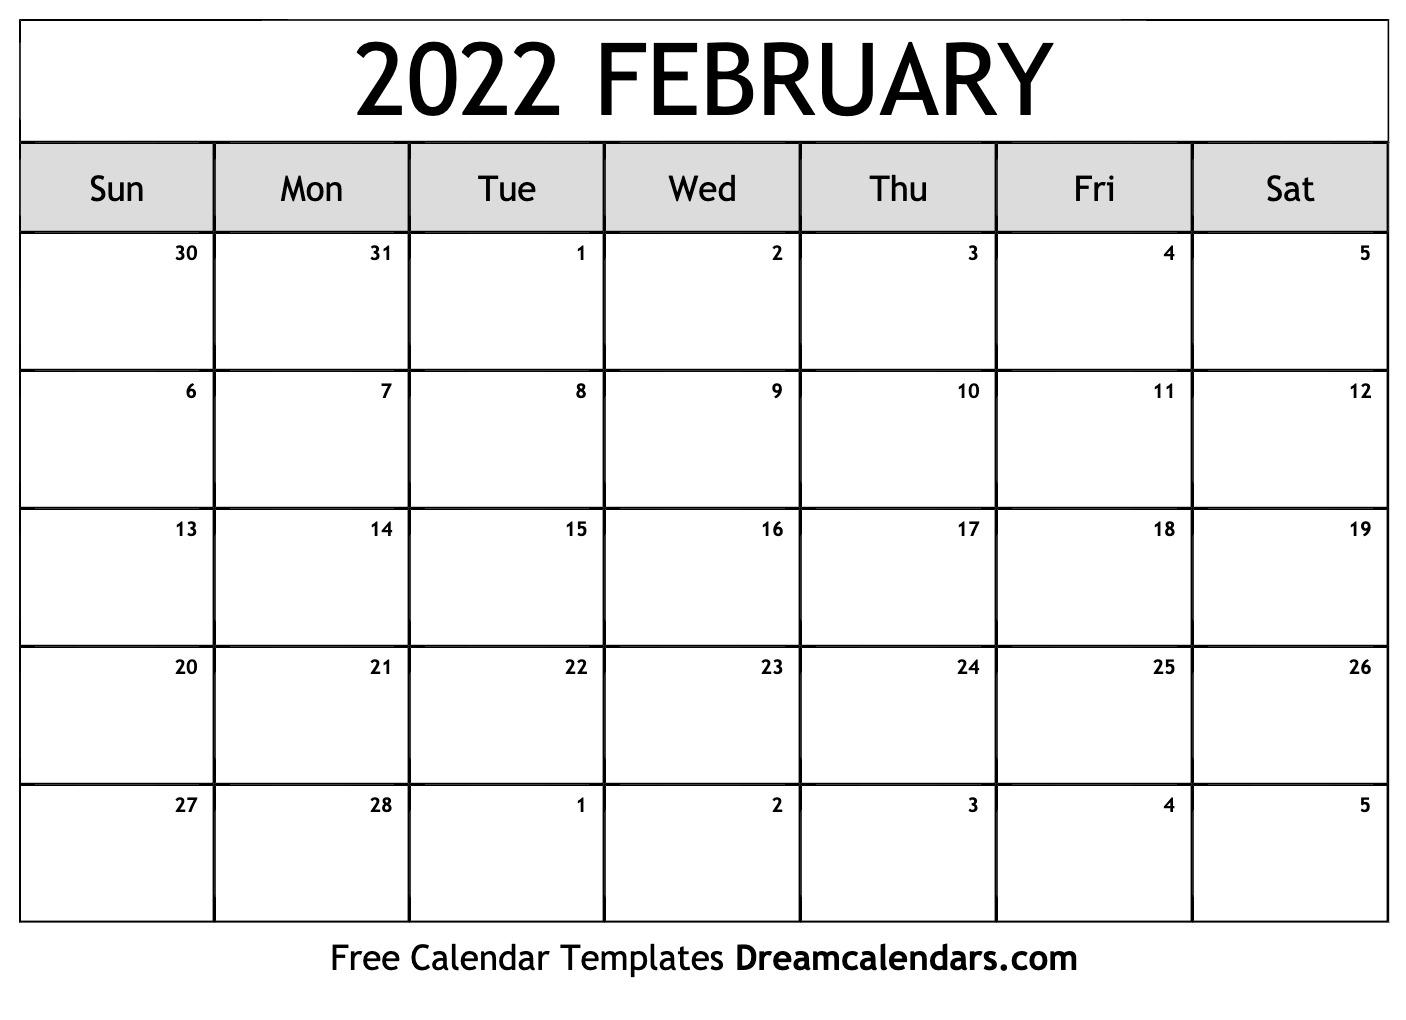 February 2022 Calendar   Free Blank Printable Templates Inside Printable Februaryy 2022 Calendar